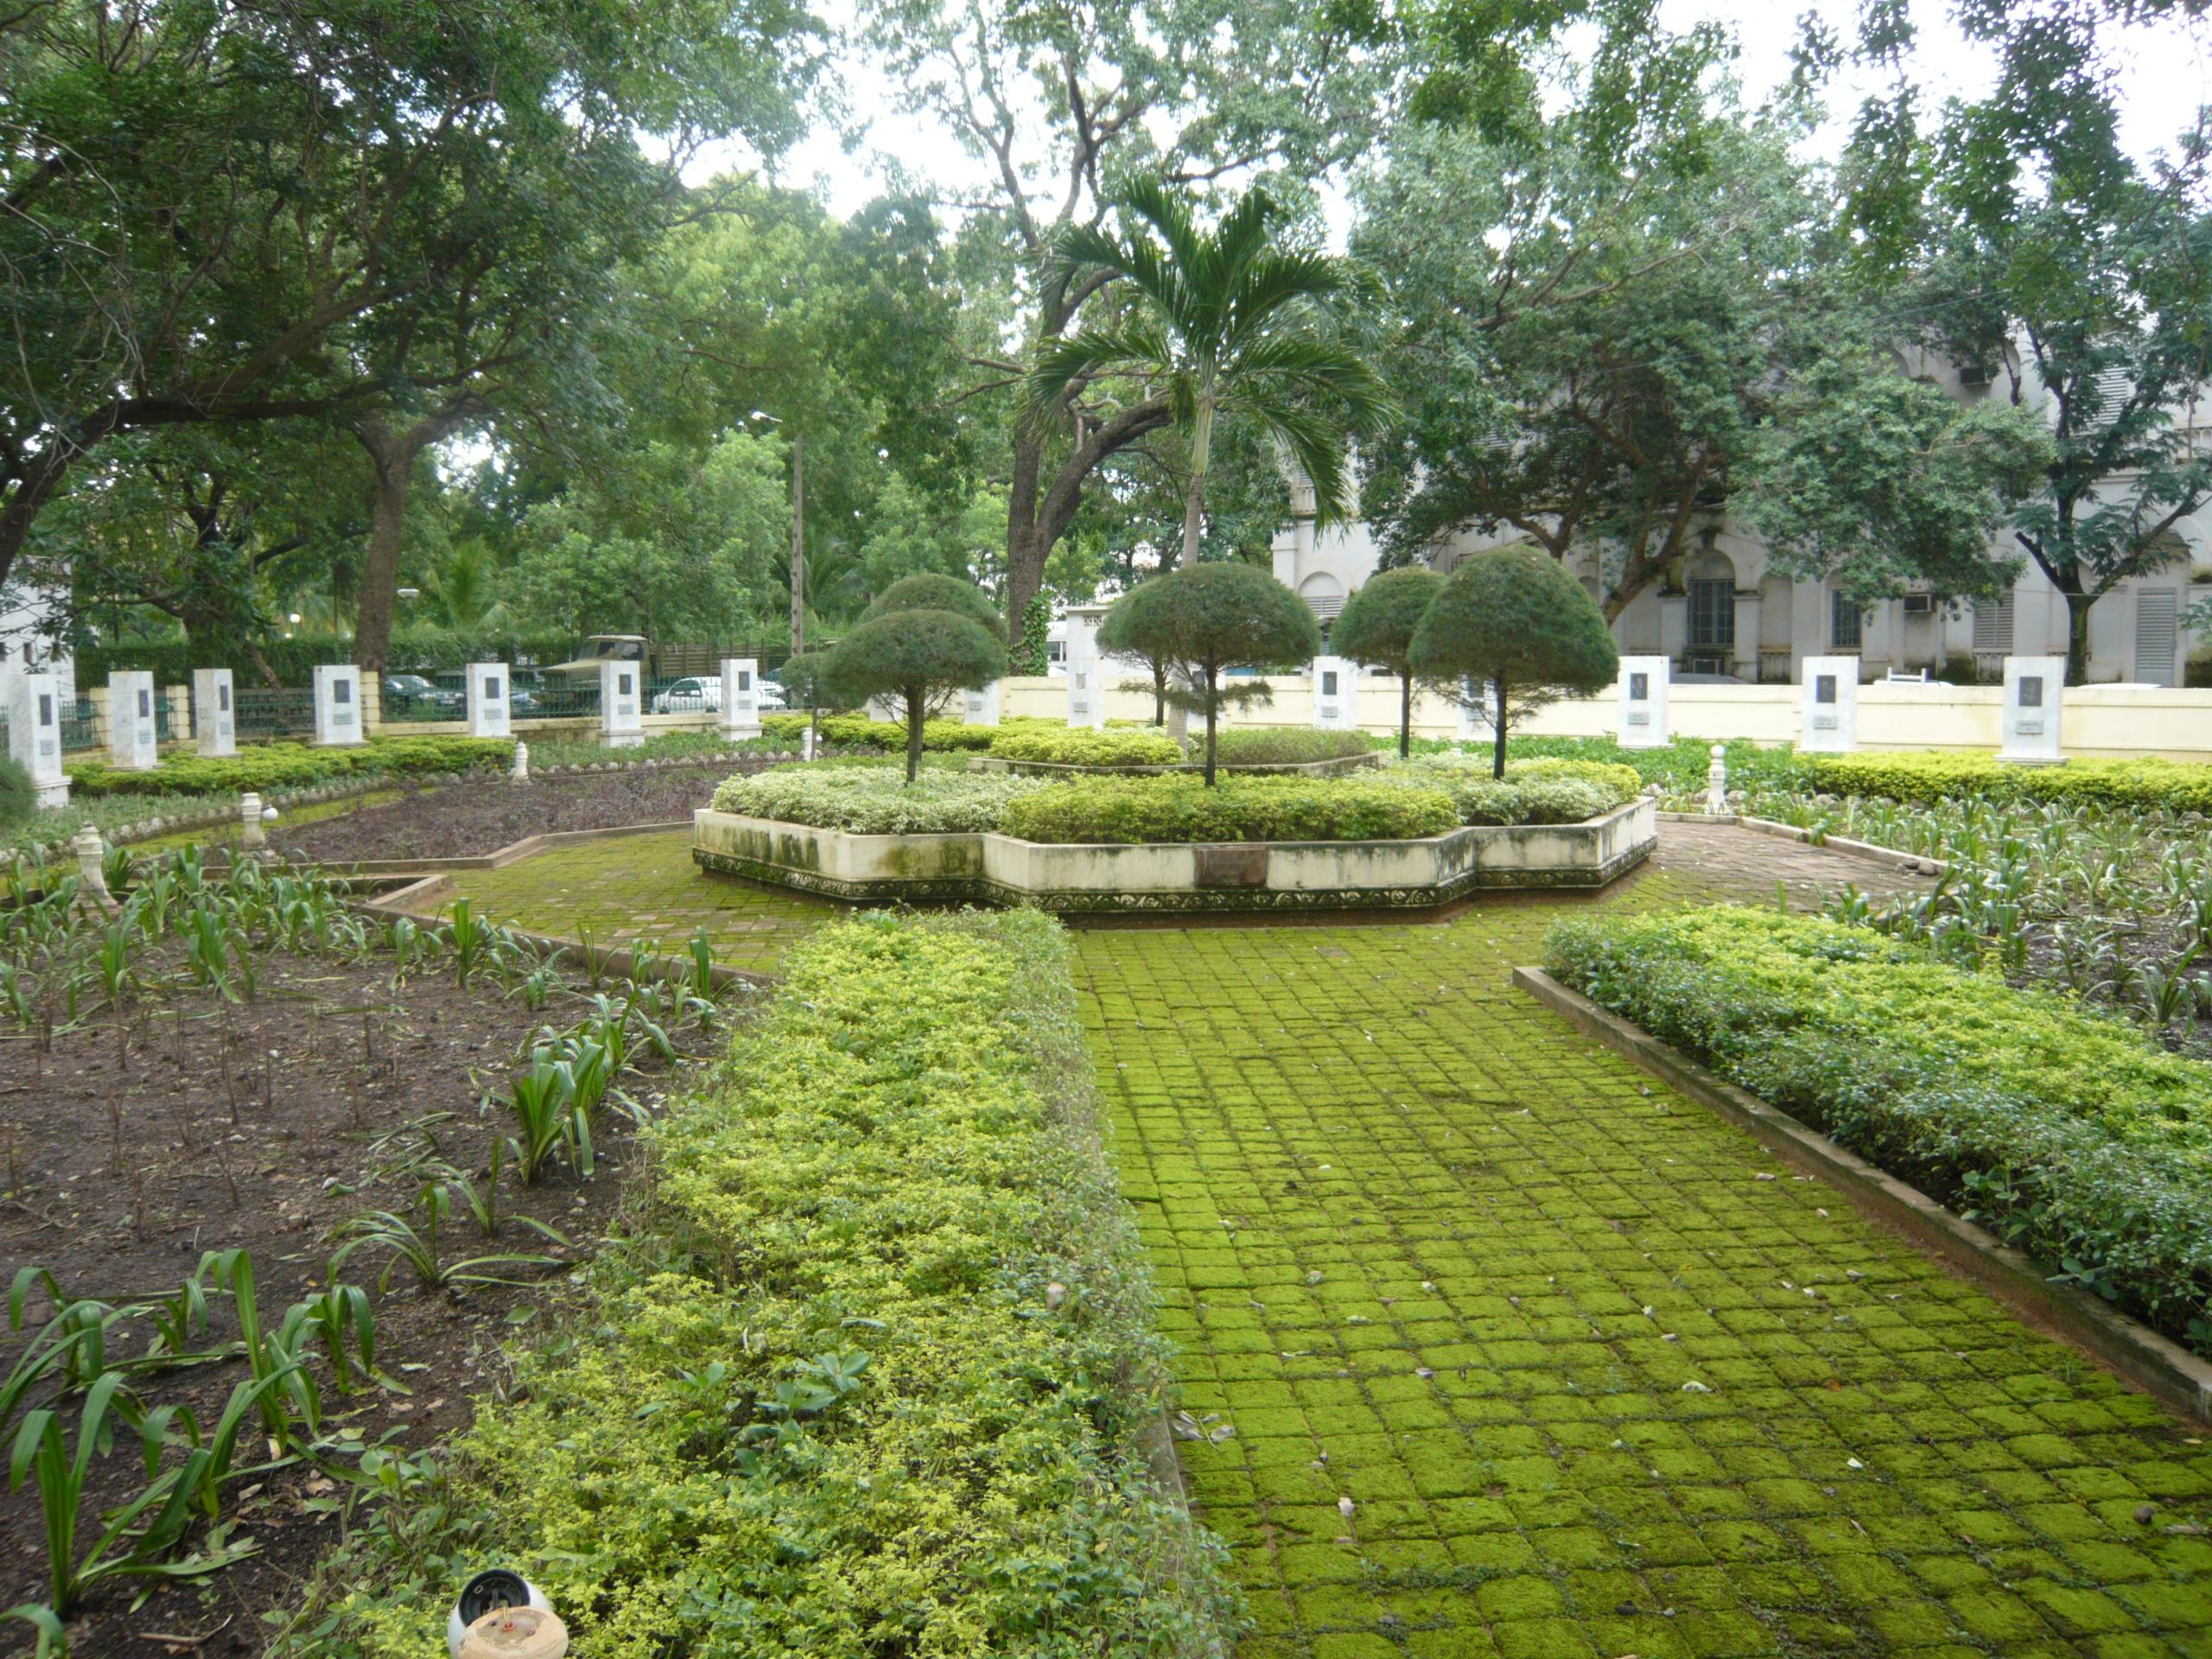 http://upload.wikimedia.org/wikipedia/commons/f/f3/Place_des_gouverneurs,_Koulouba_-_Bamako.jpg